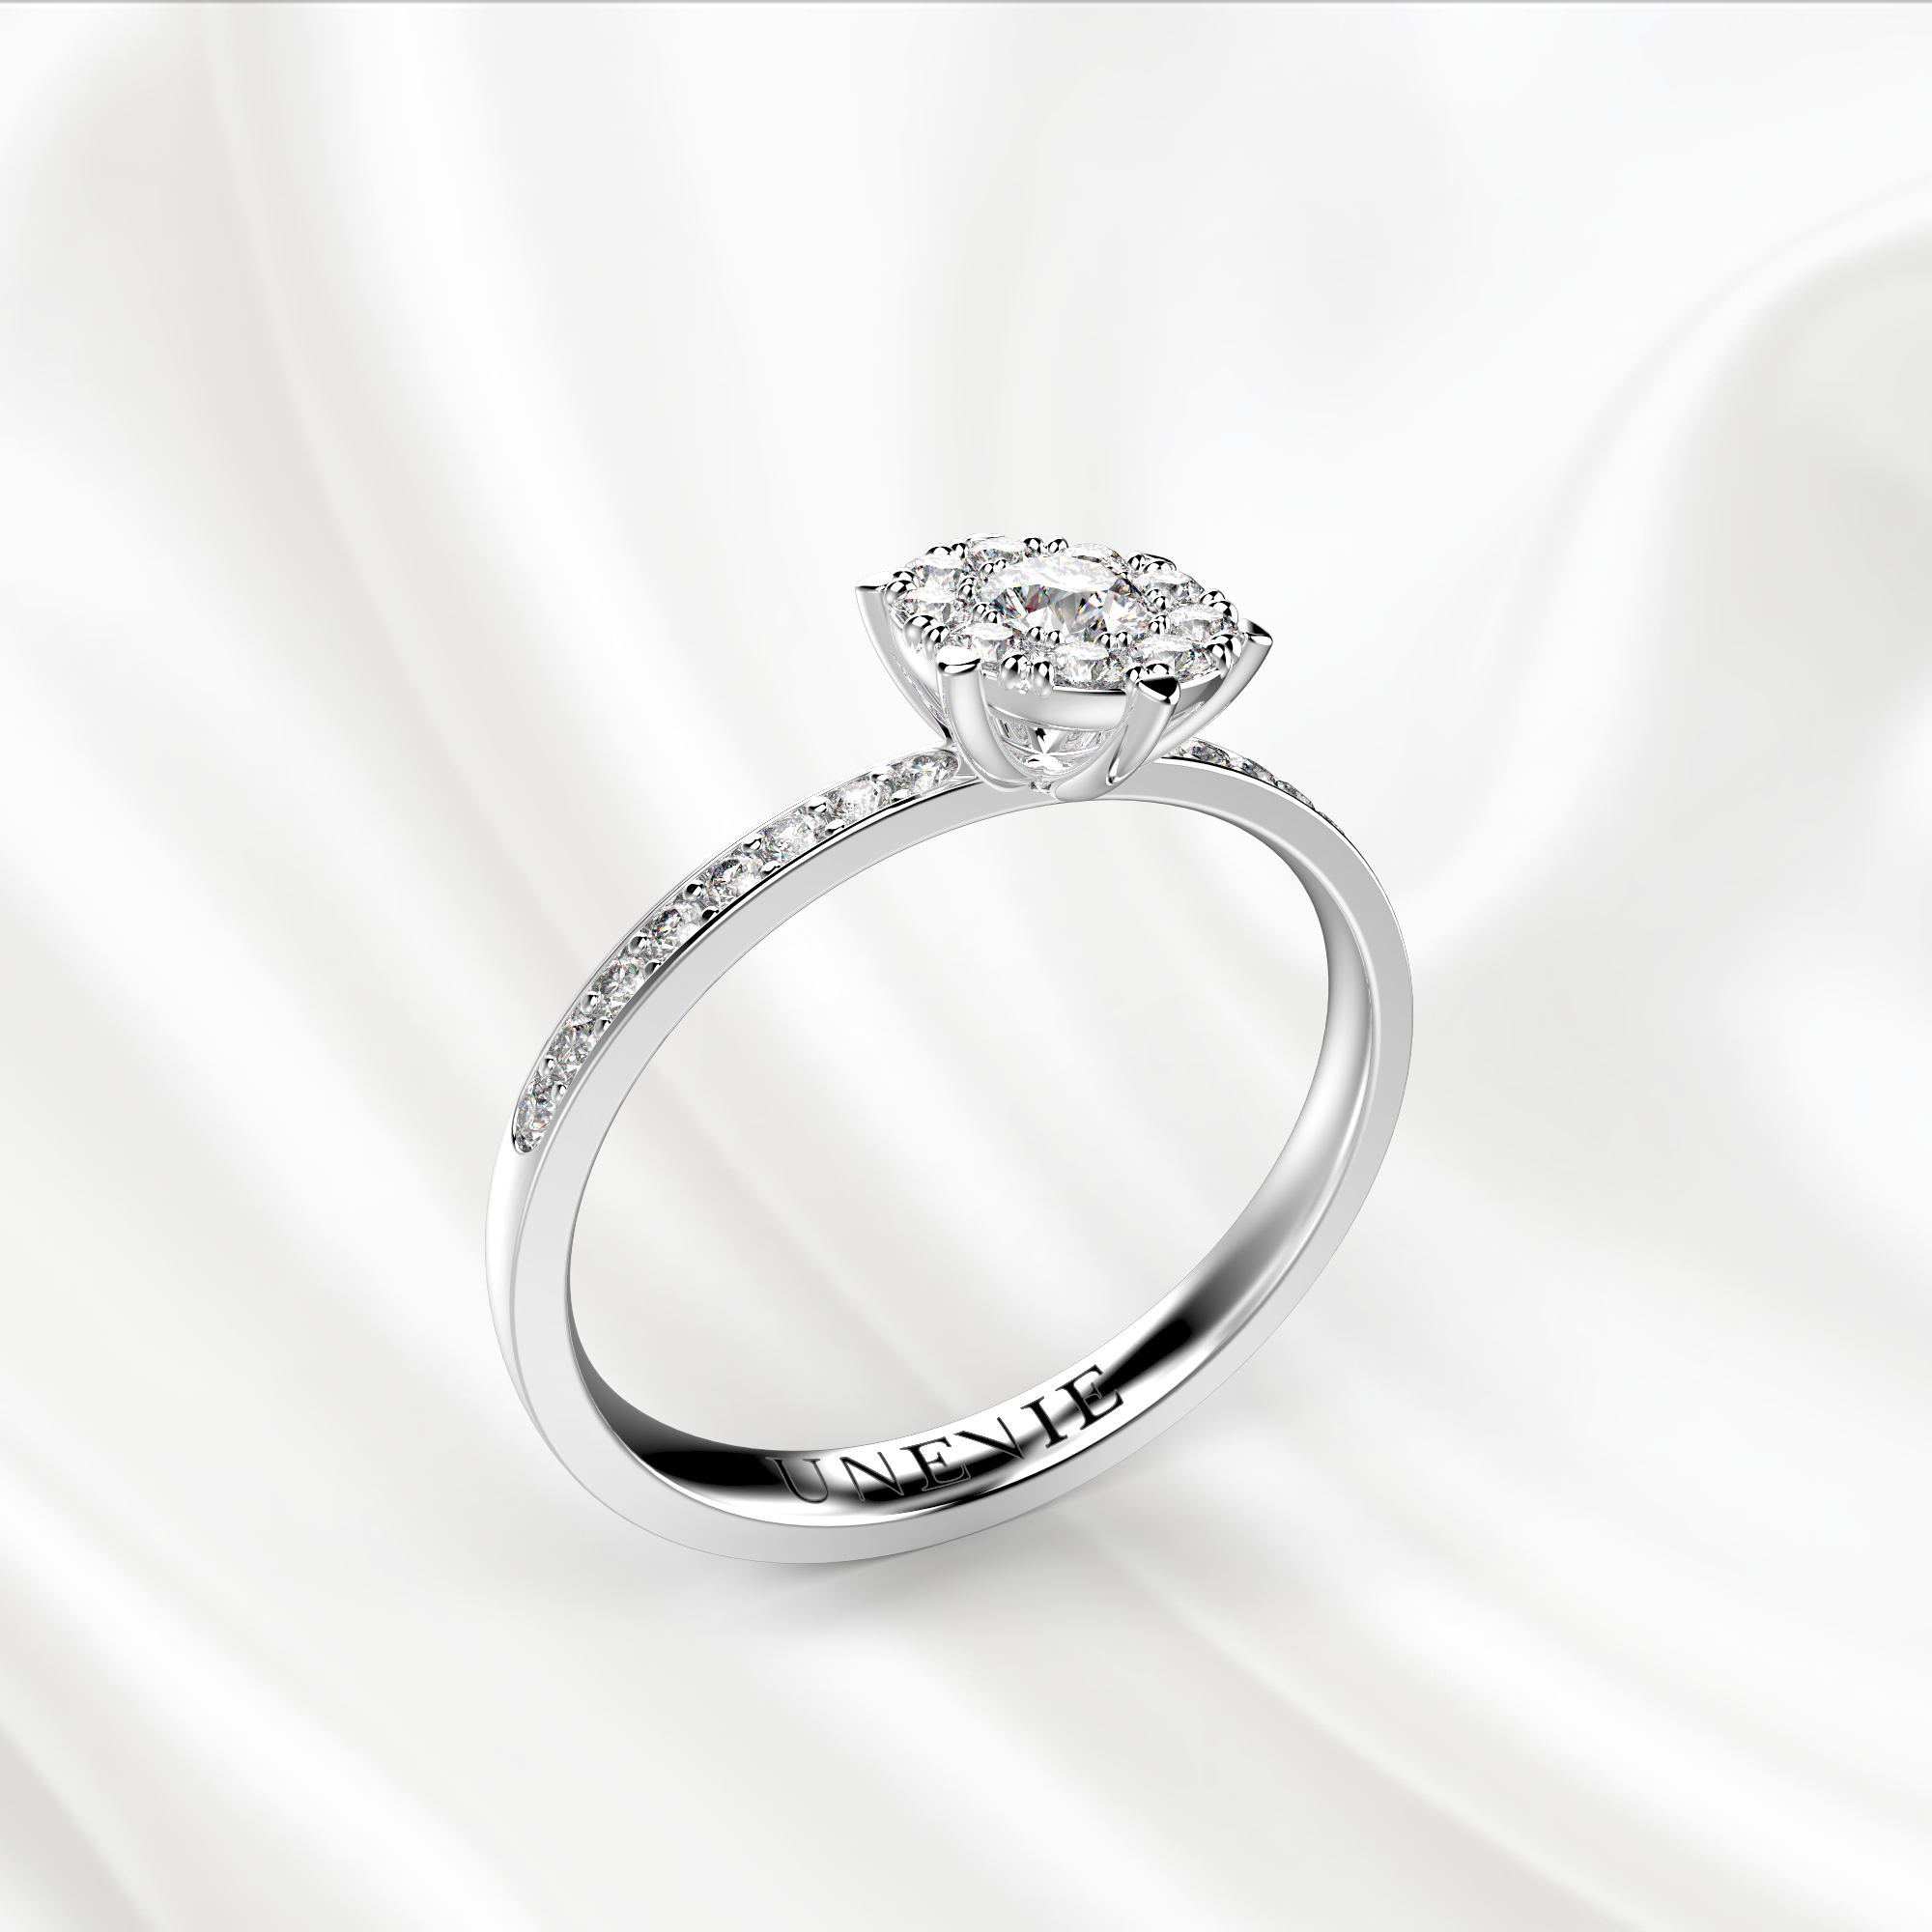 N27 Помолвочное кольцо из белого золота с бриллиантами